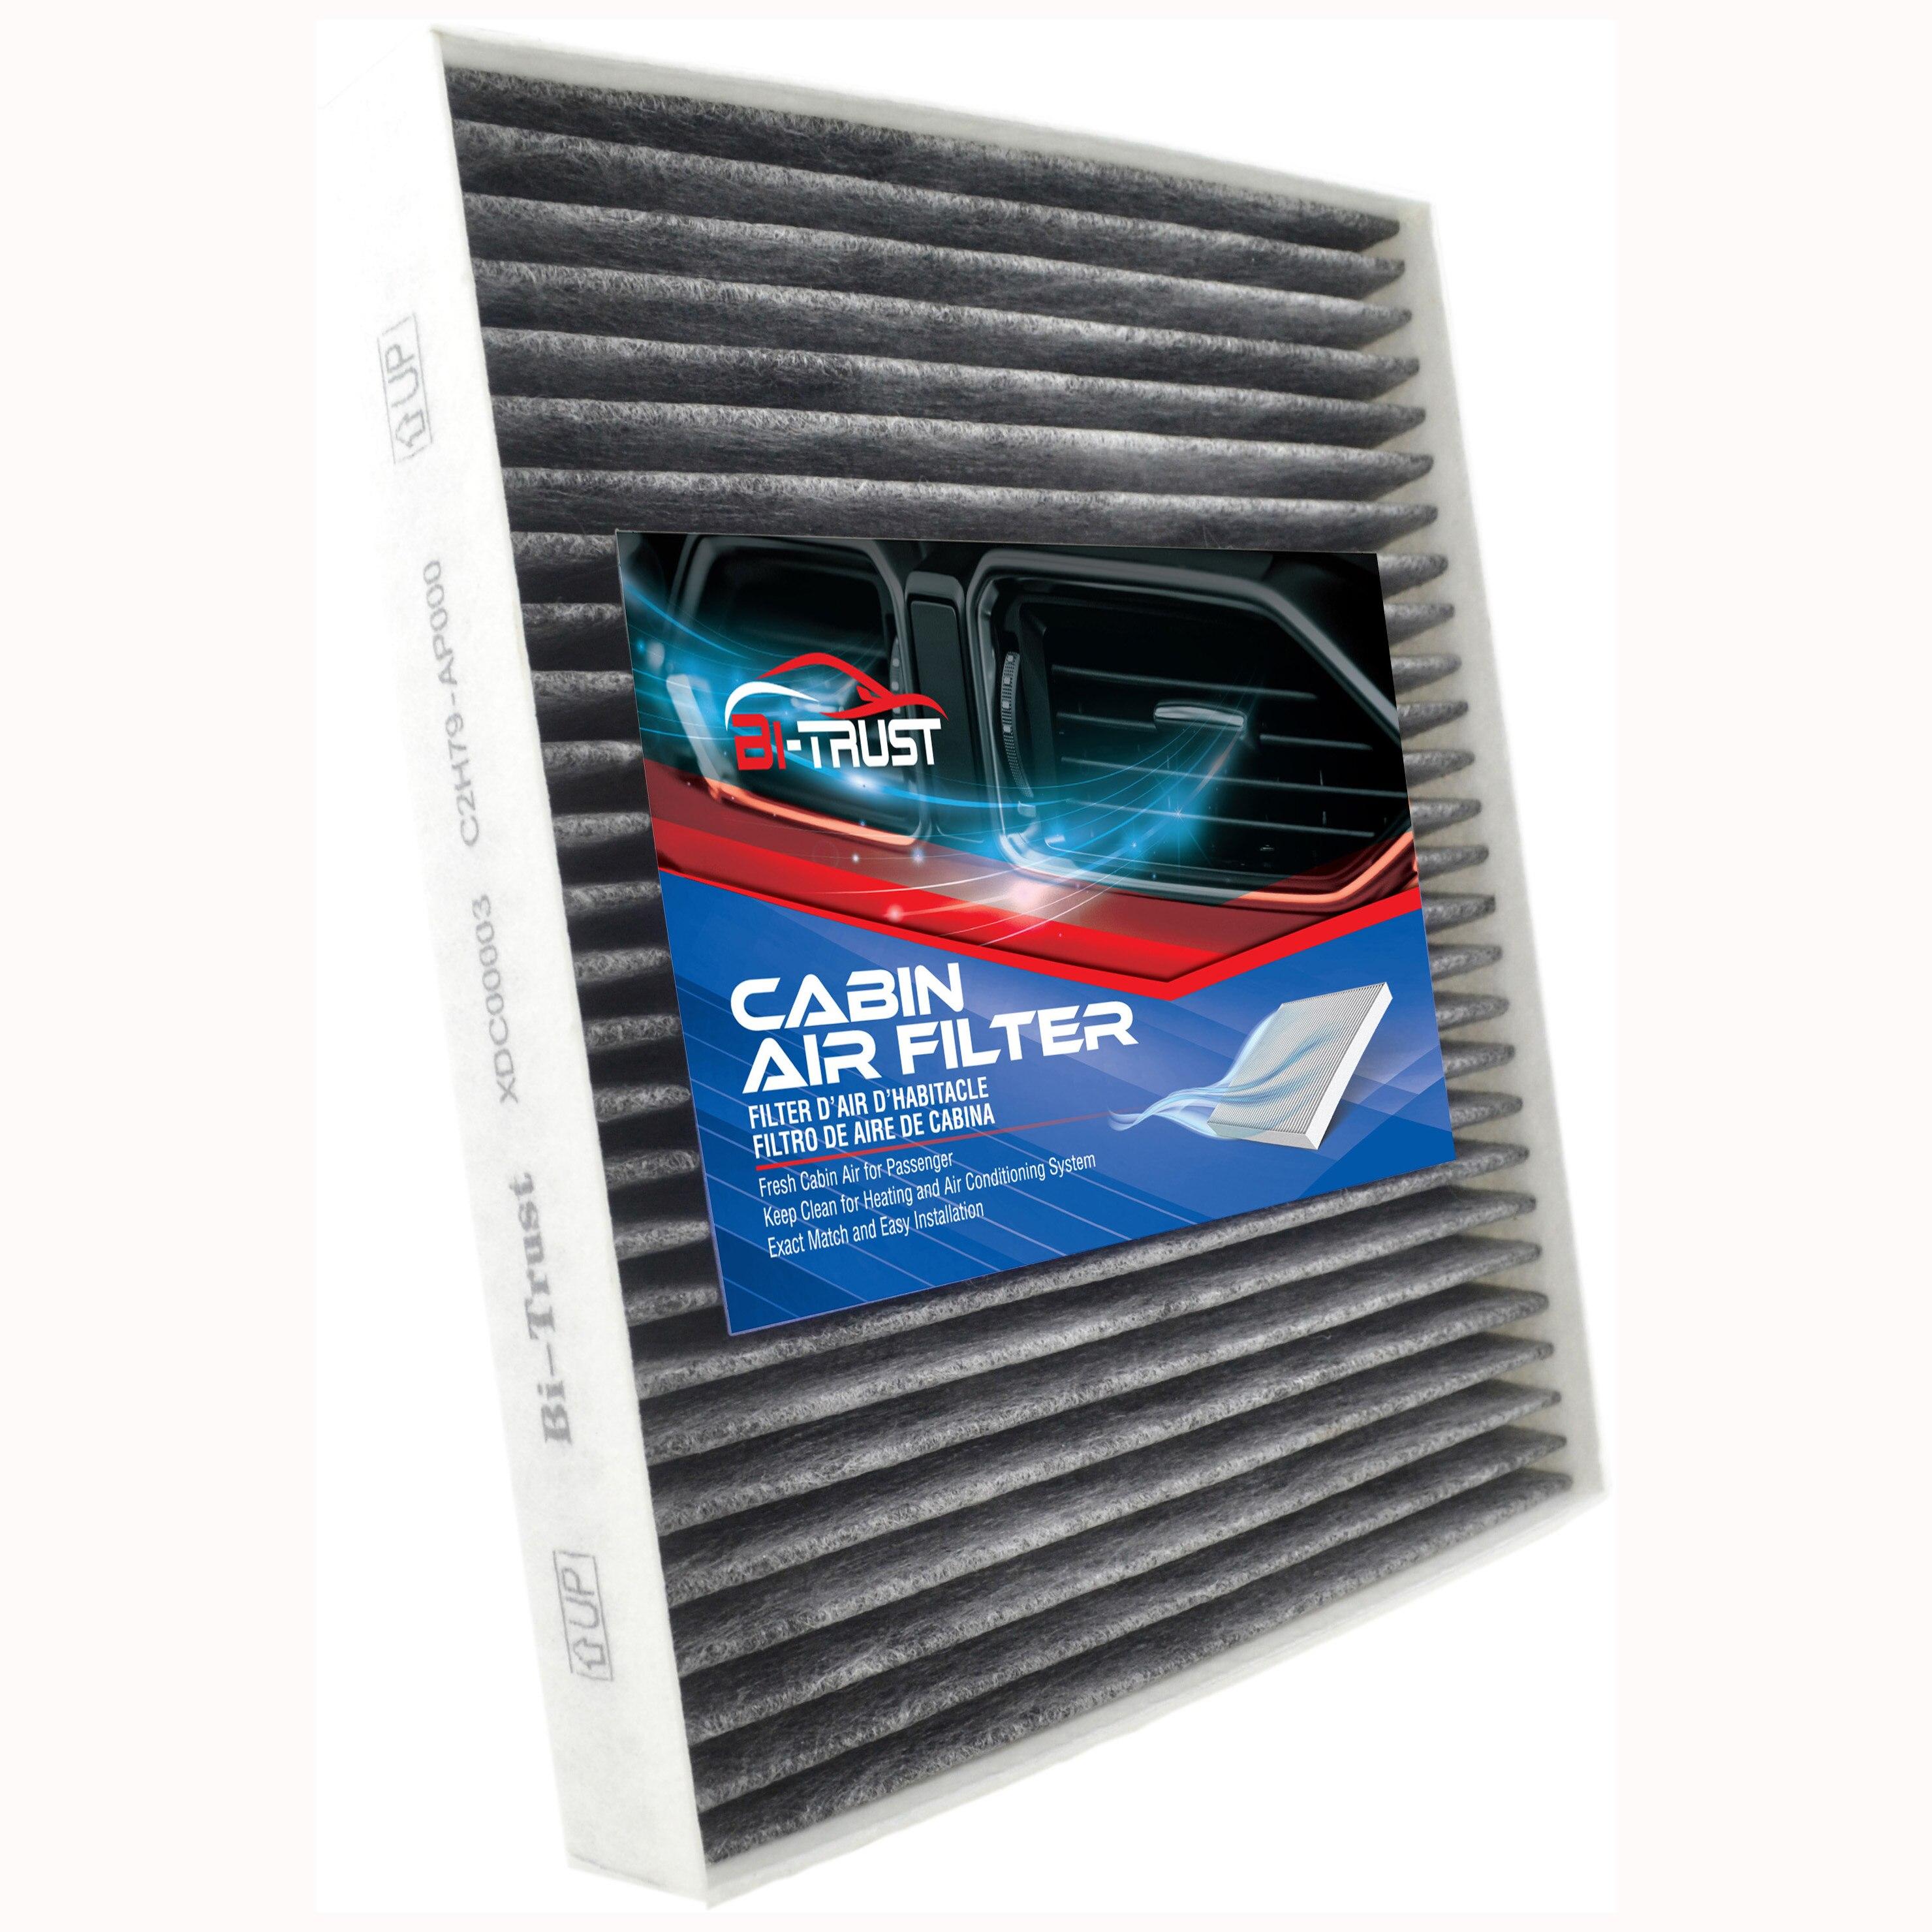 Air Filters Filters informafutbol.com Cabin Air Filter Pronto ...